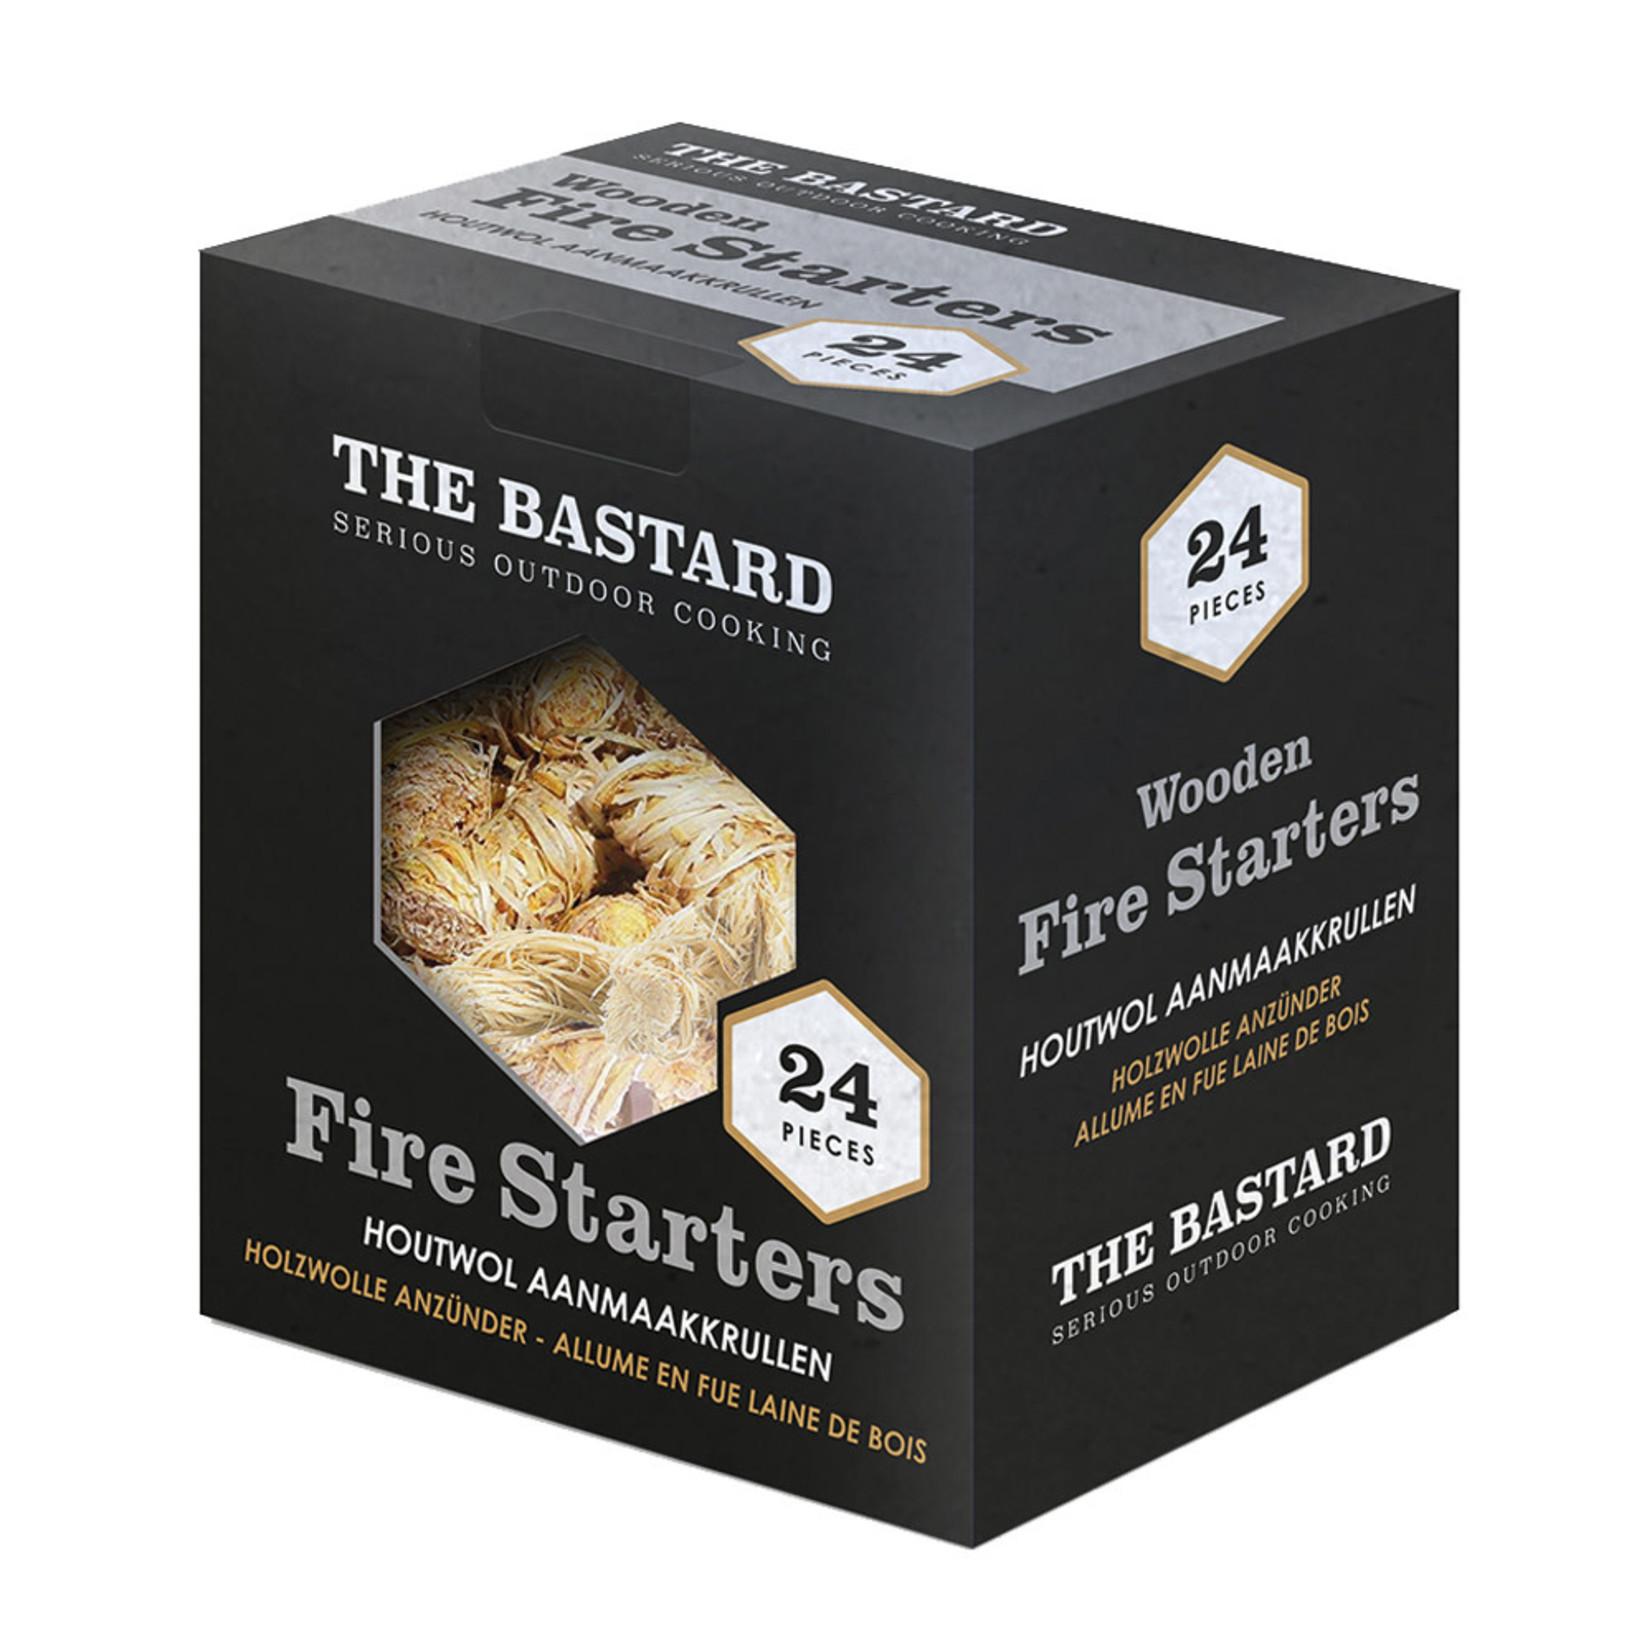 The Bastard The Bastard Wooden Fire Starters 24st 350gr